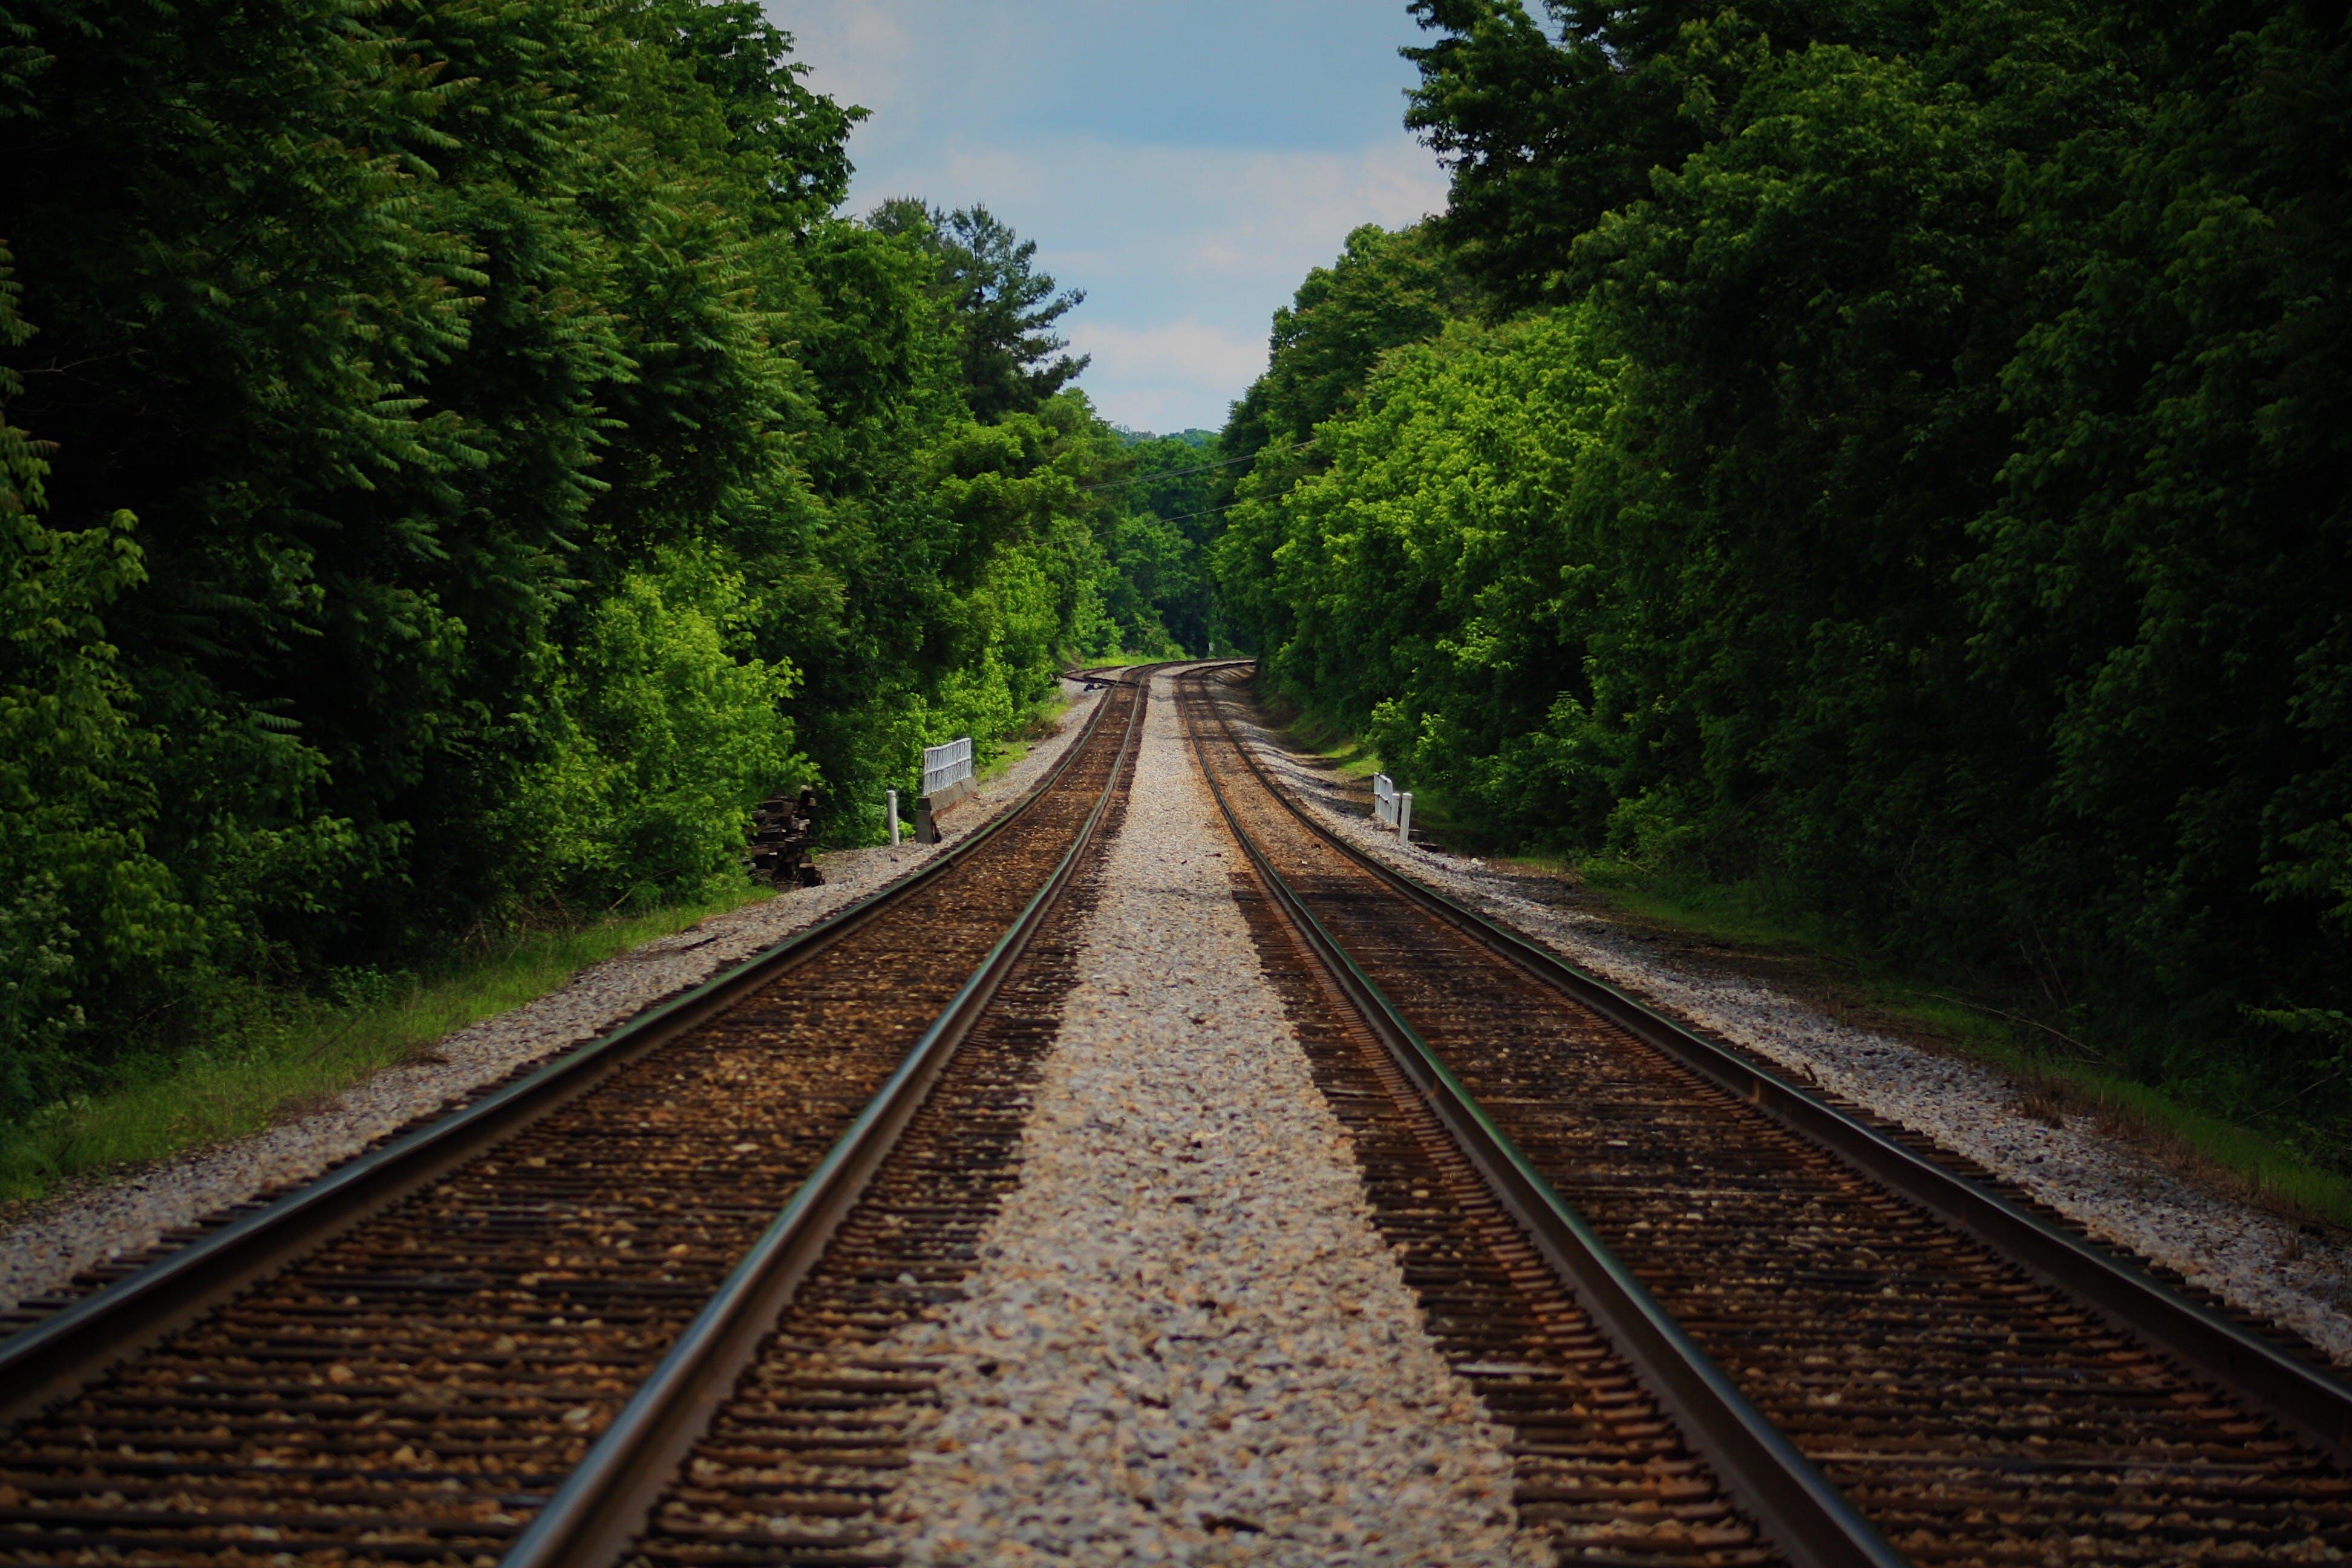 Brown Train Railway Between Green Trees at Daytime